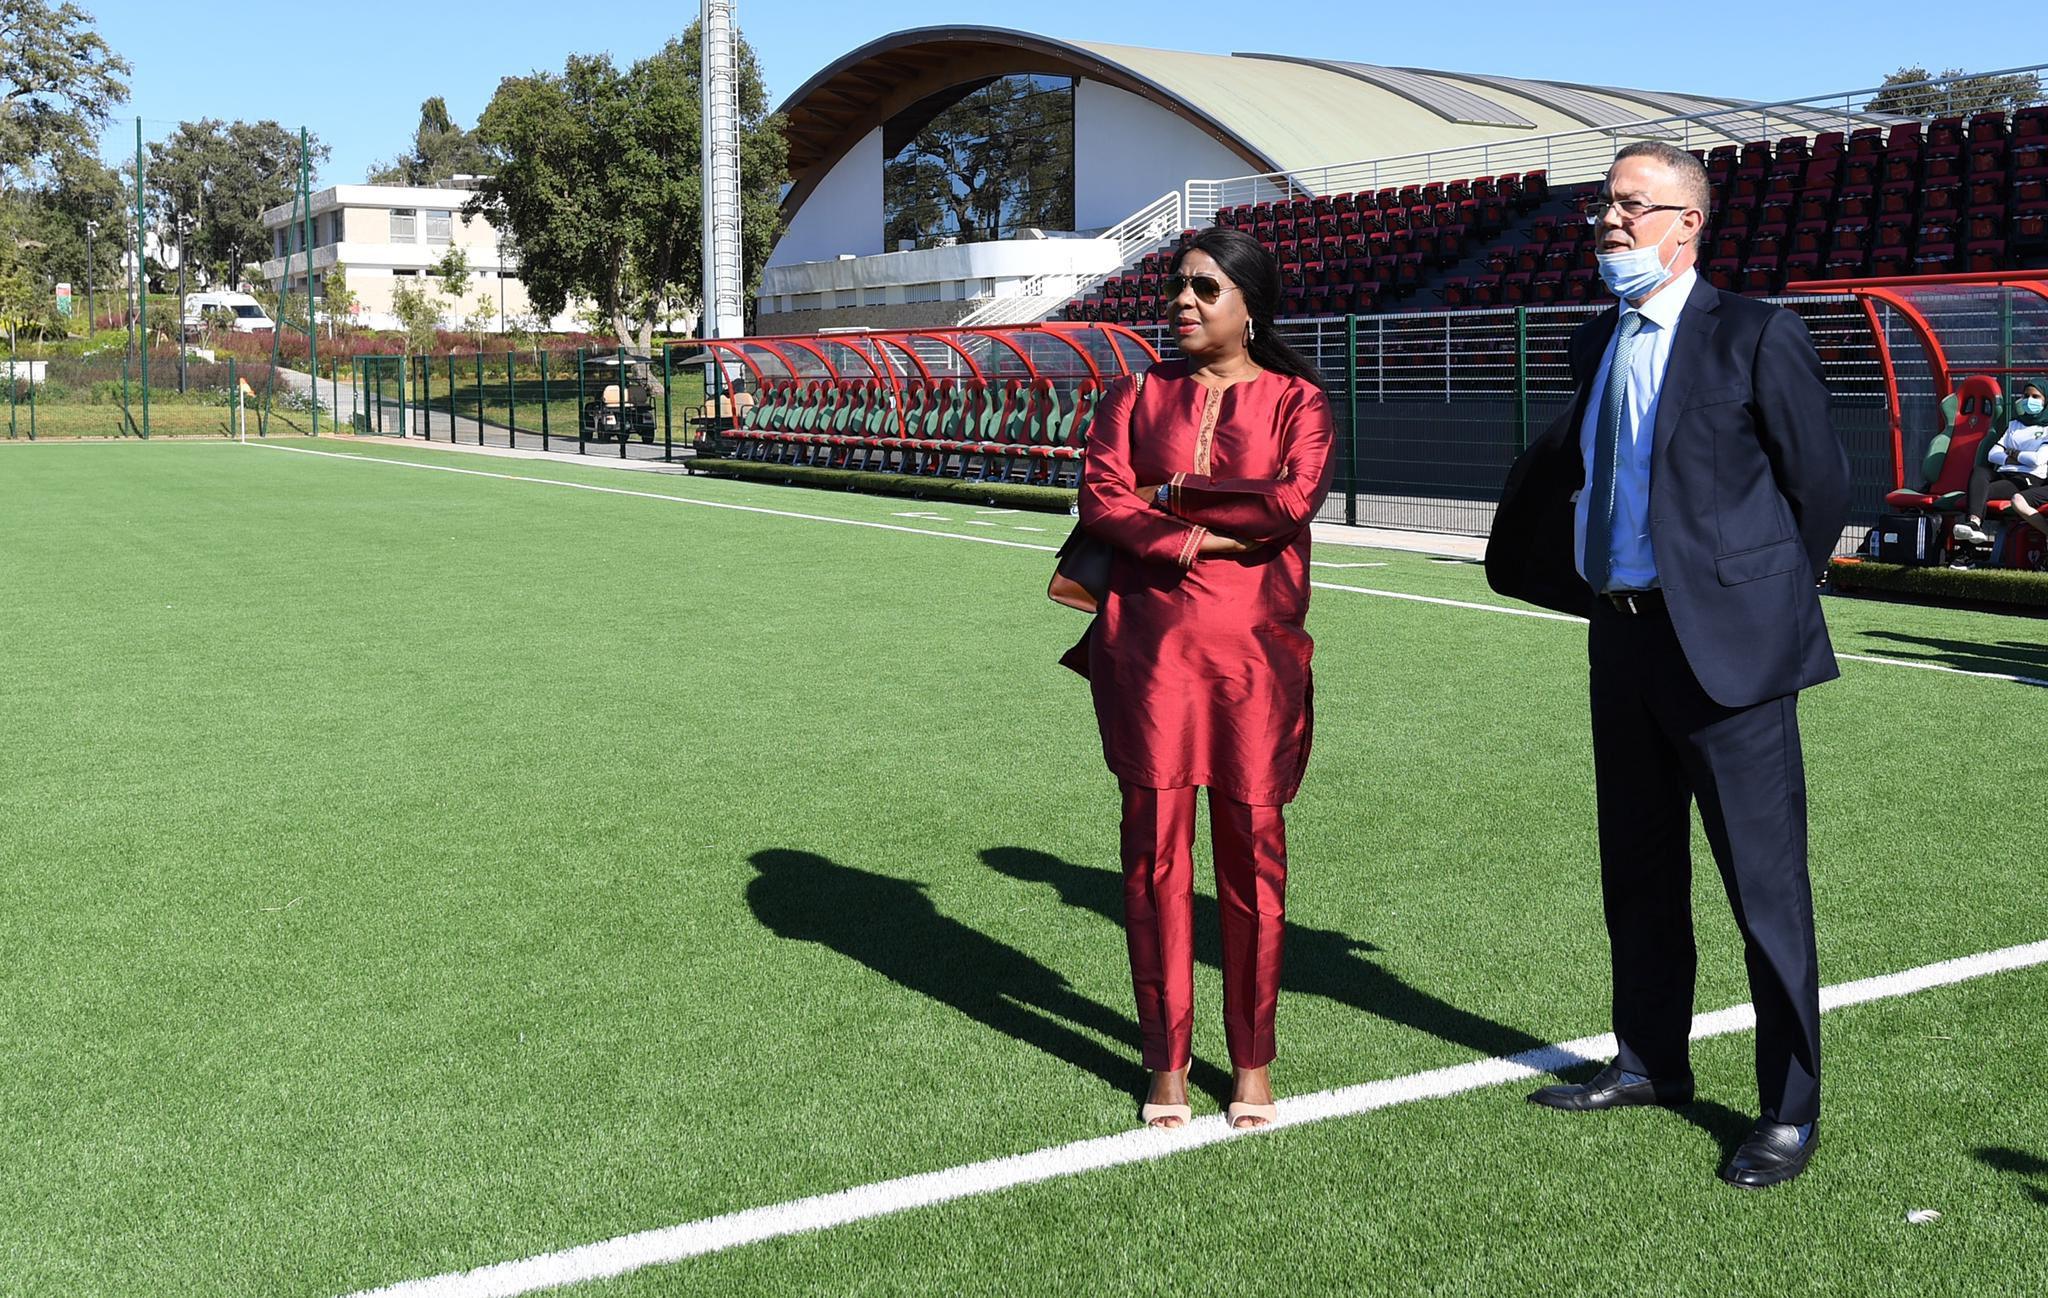 Fatouma Samoura en compagnie du président de la fédération marocaine, Faouzi Lekjaâ, au complexe Mohammed VI de football.